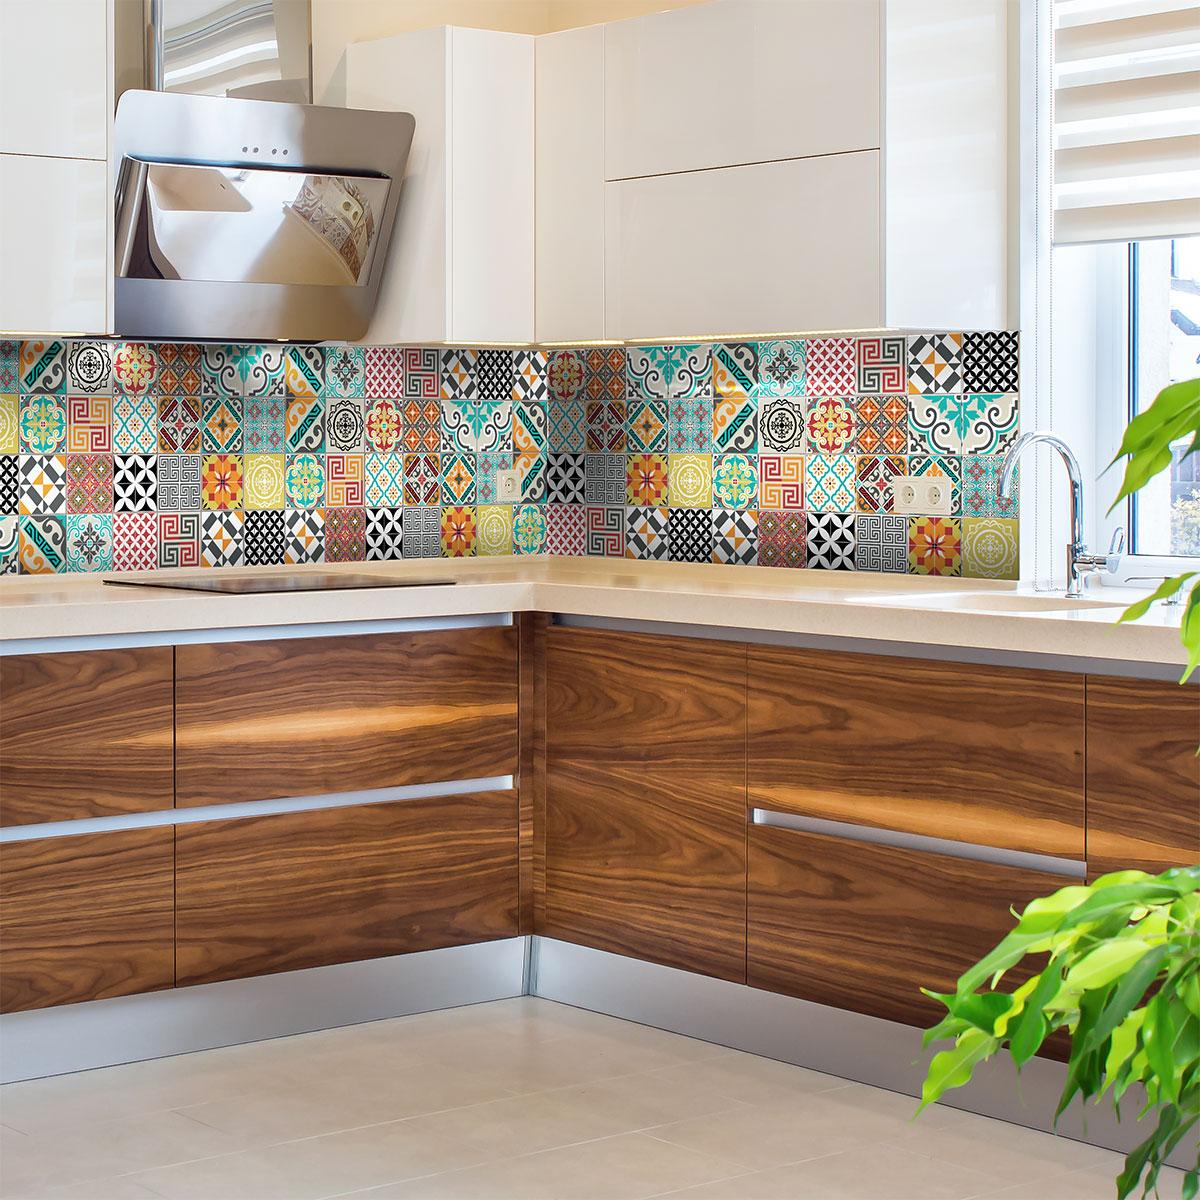 24 stickers carrelages azulejos tina cuisine carrelages ambiance sticker. Black Bedroom Furniture Sets. Home Design Ideas